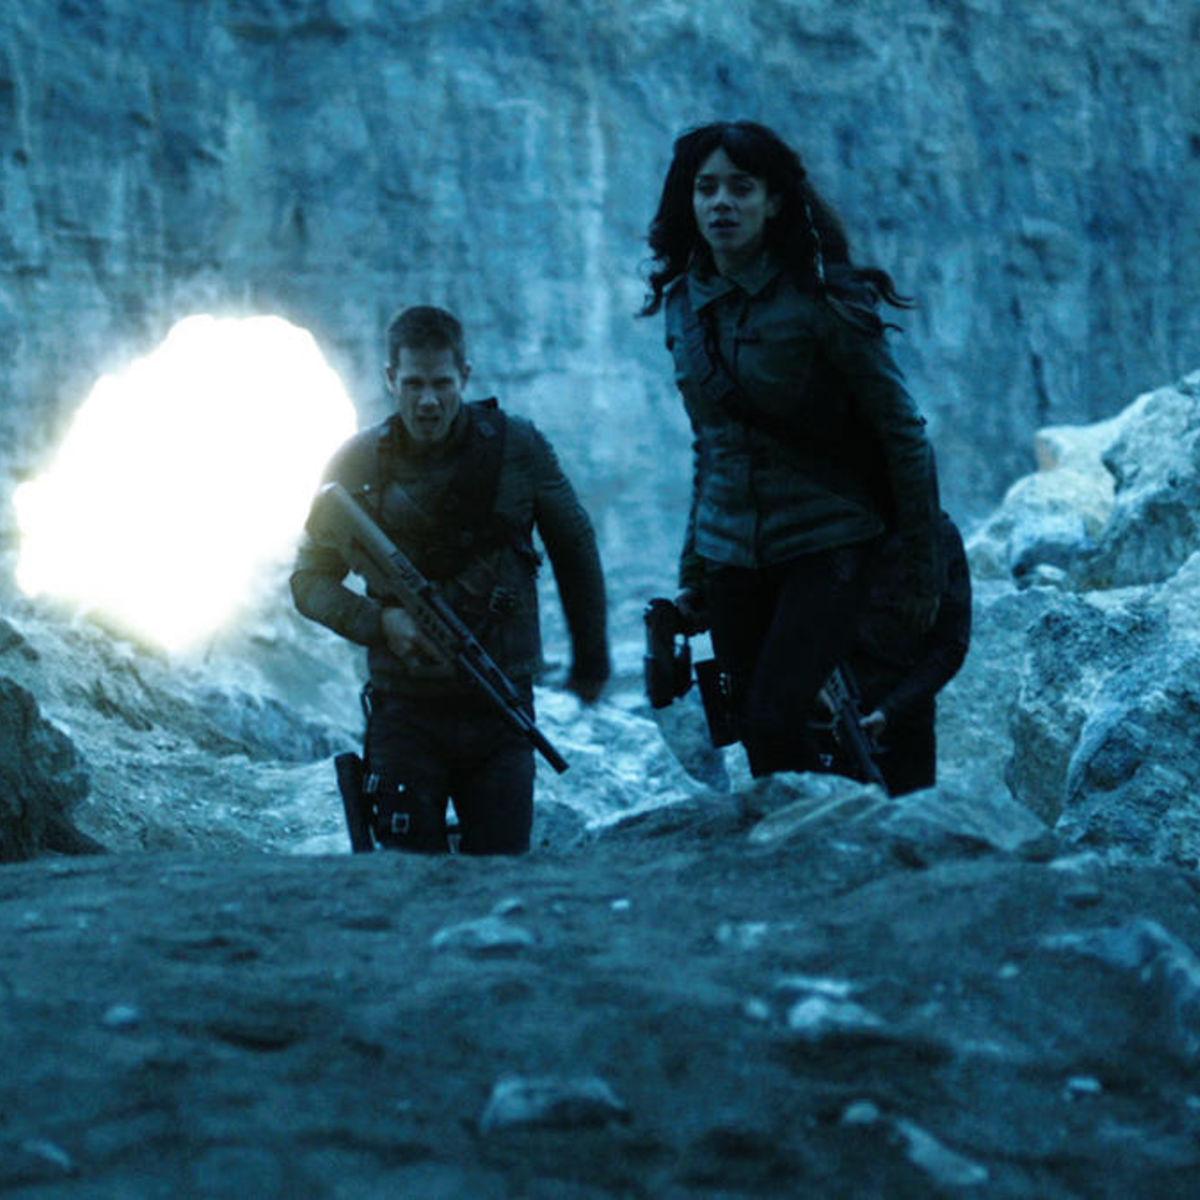 The Killjoys Season 2 premiere picks up right where we left off - Blastr